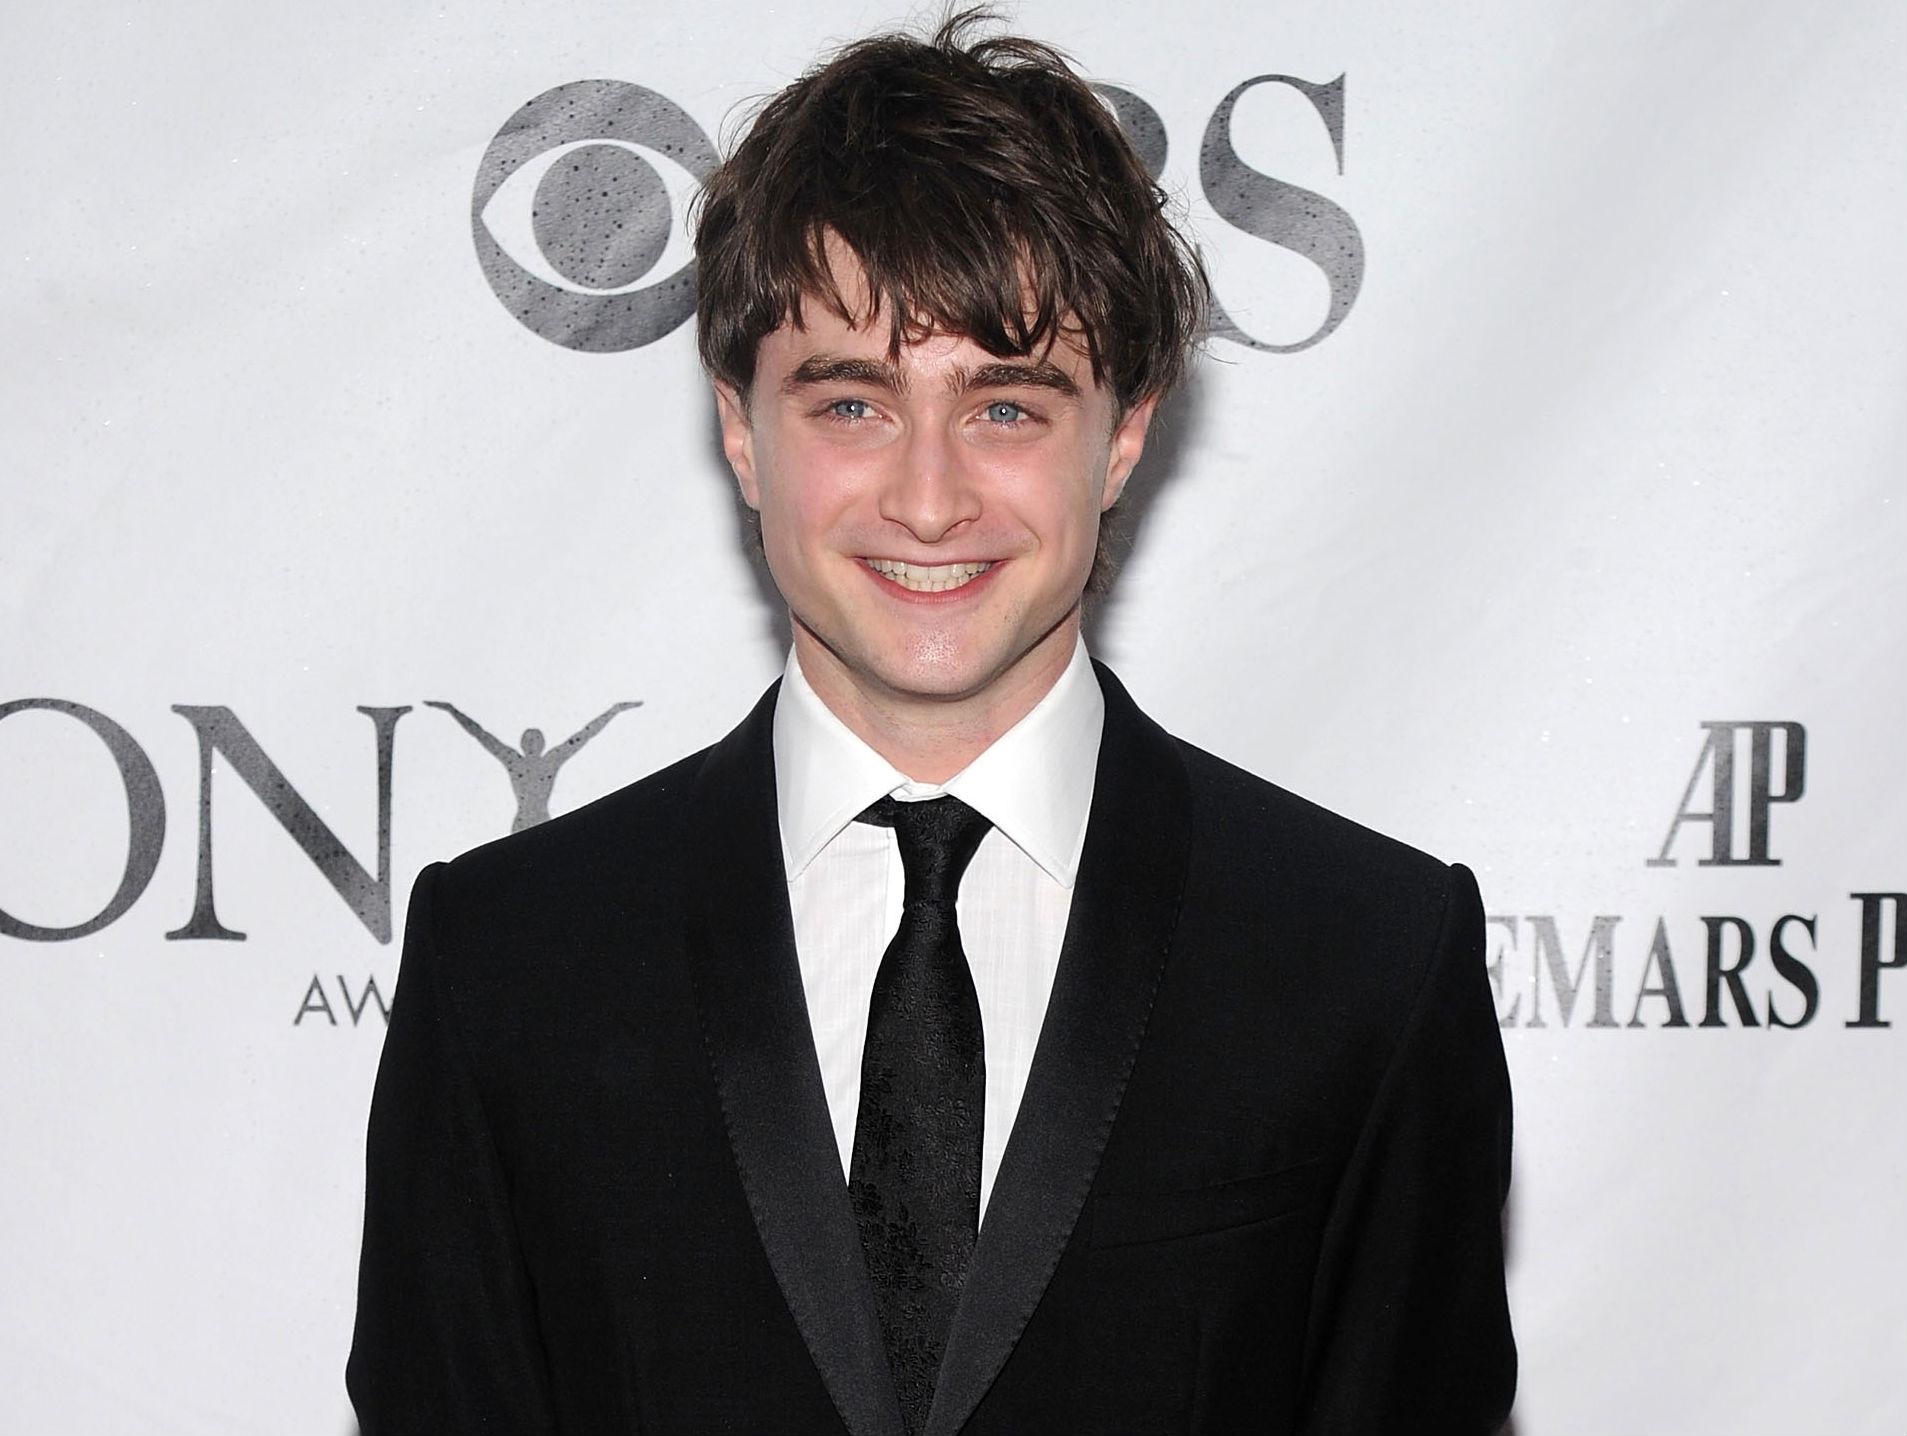 Daniel Radcliffe Is Richer Than Royalty